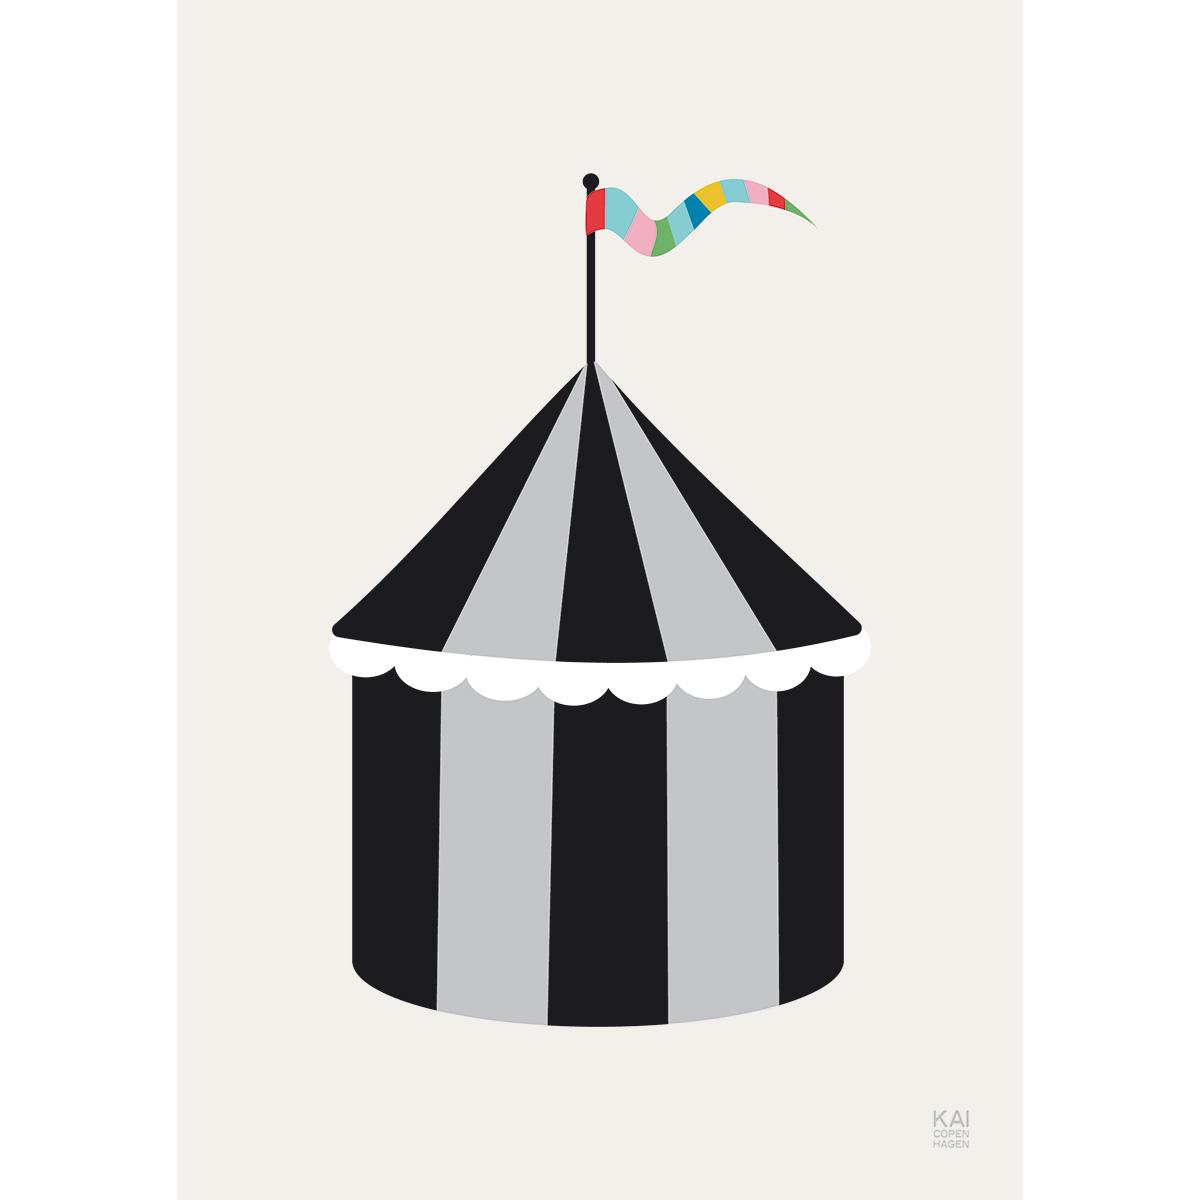 Image of   Kai Copenhagen plakat - Cirkus